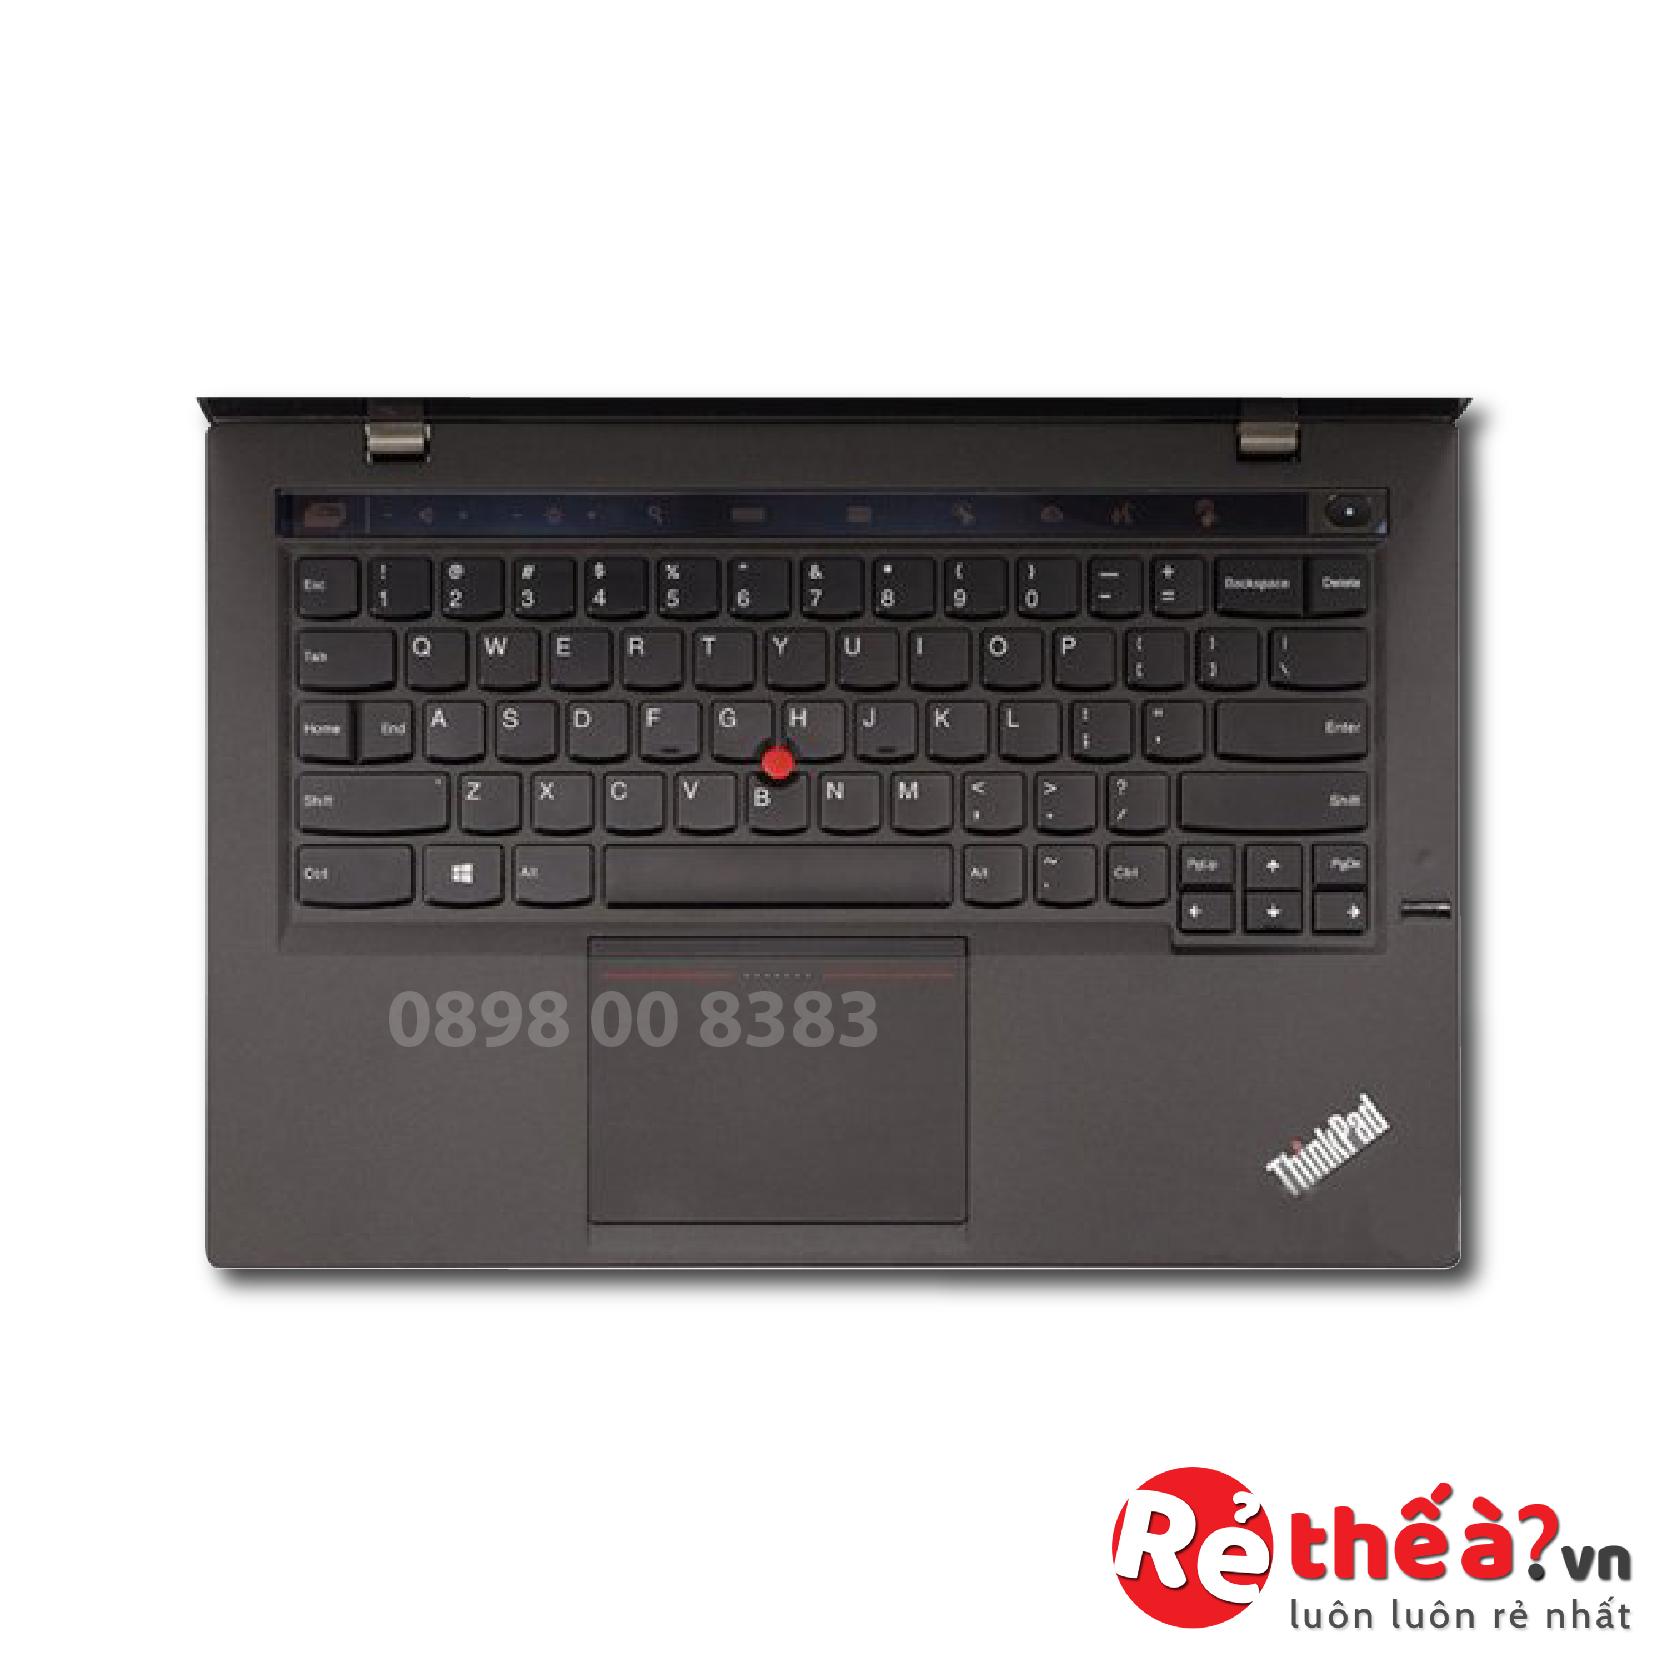 Laptop Lenovo Thinkpad X1 Carbon Gen 2